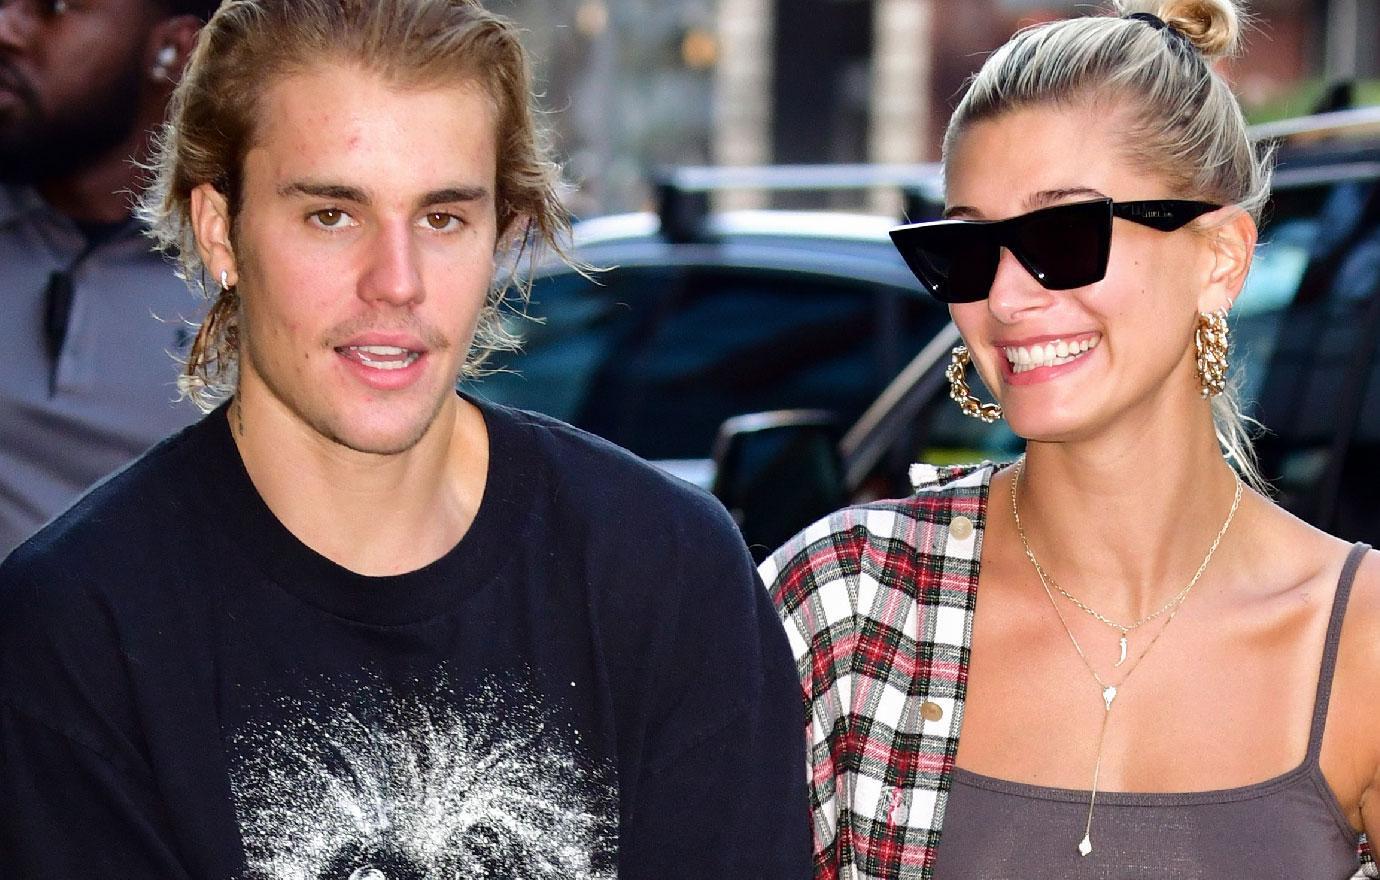 Justin Bieber Has No Prenup Marrying Hailey Baldwin